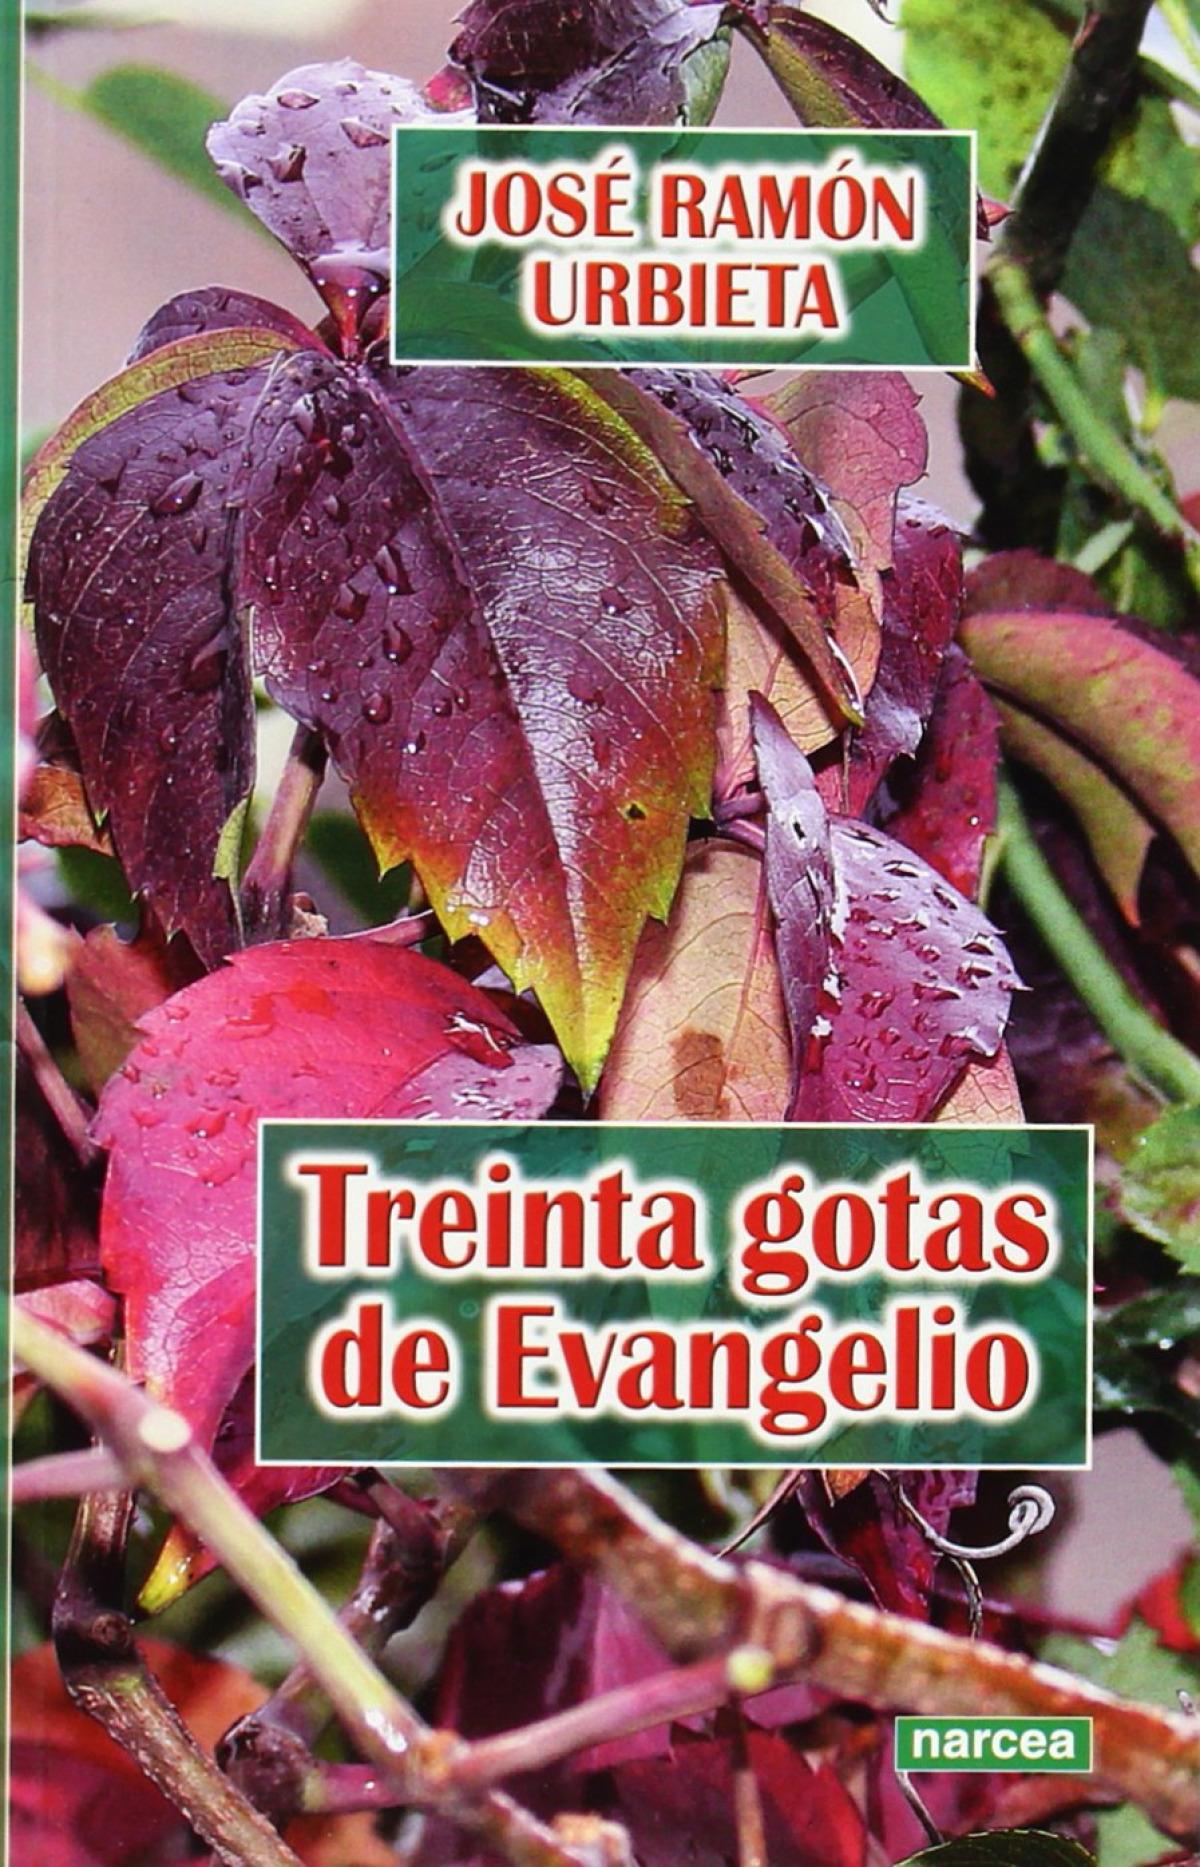 TREINTA GOTAS DE EVANGELIO